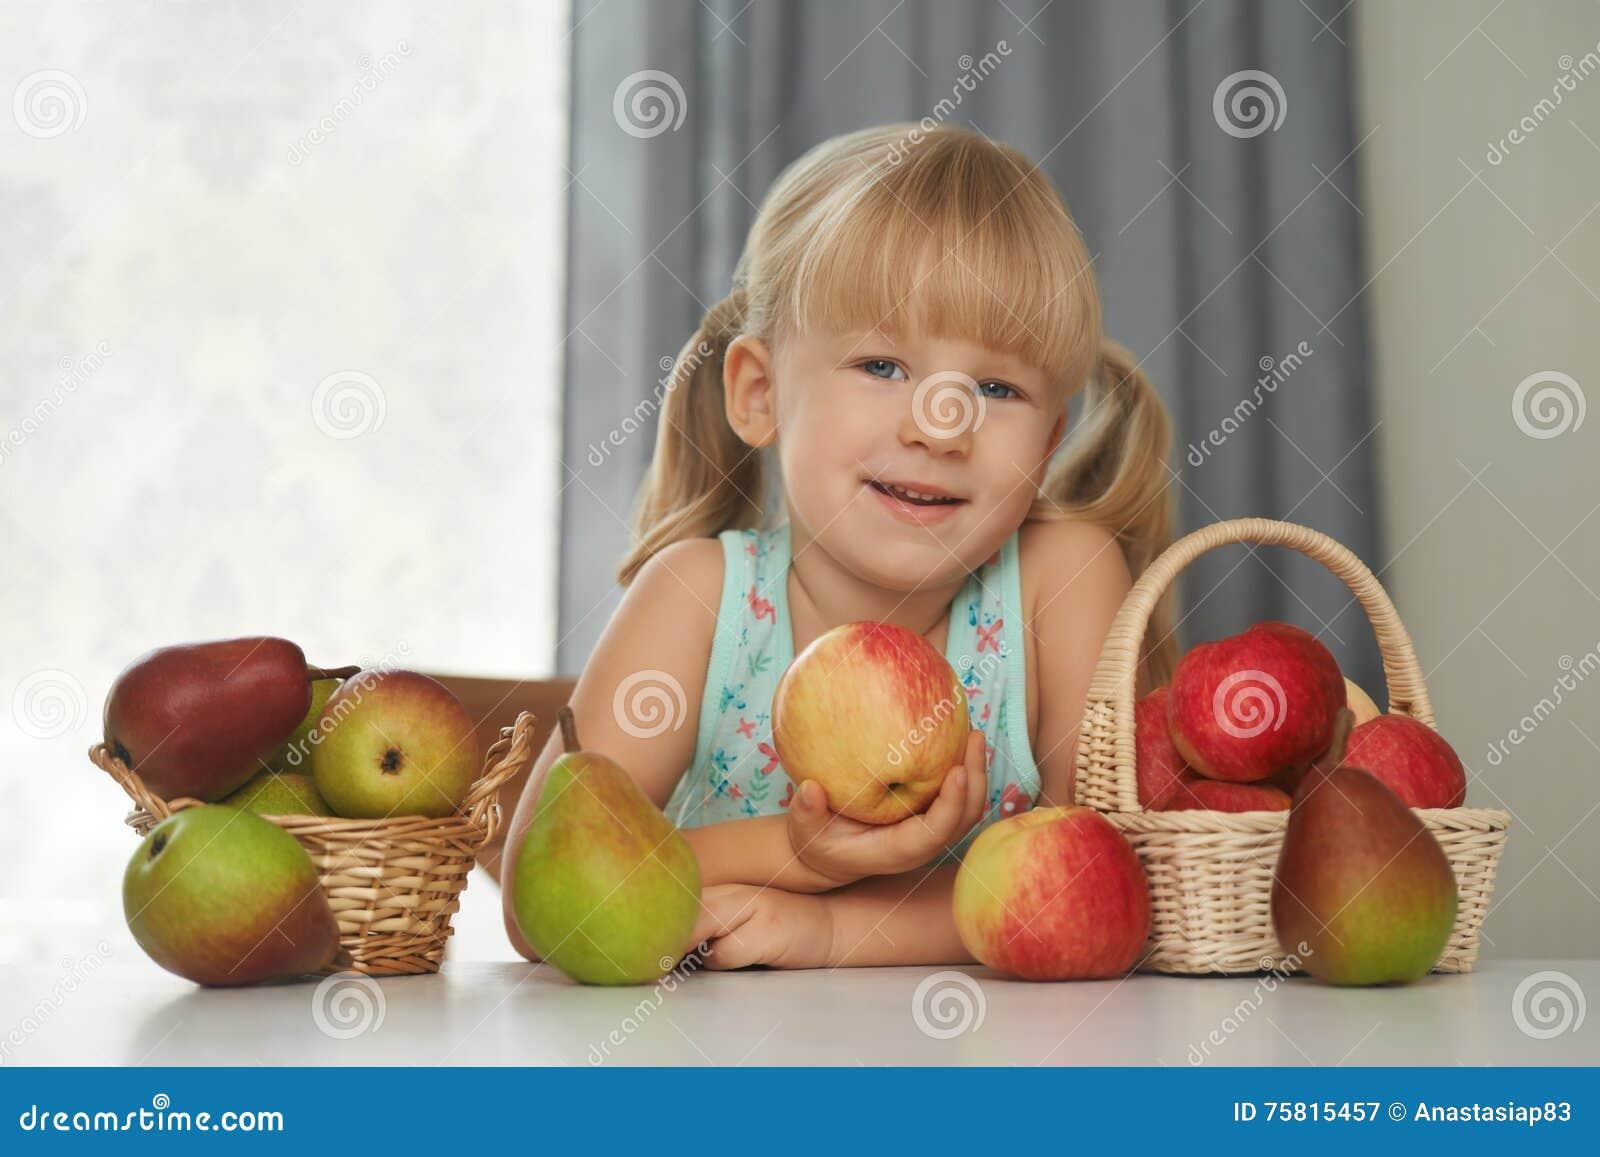 Child choosing a fresh apple to eat